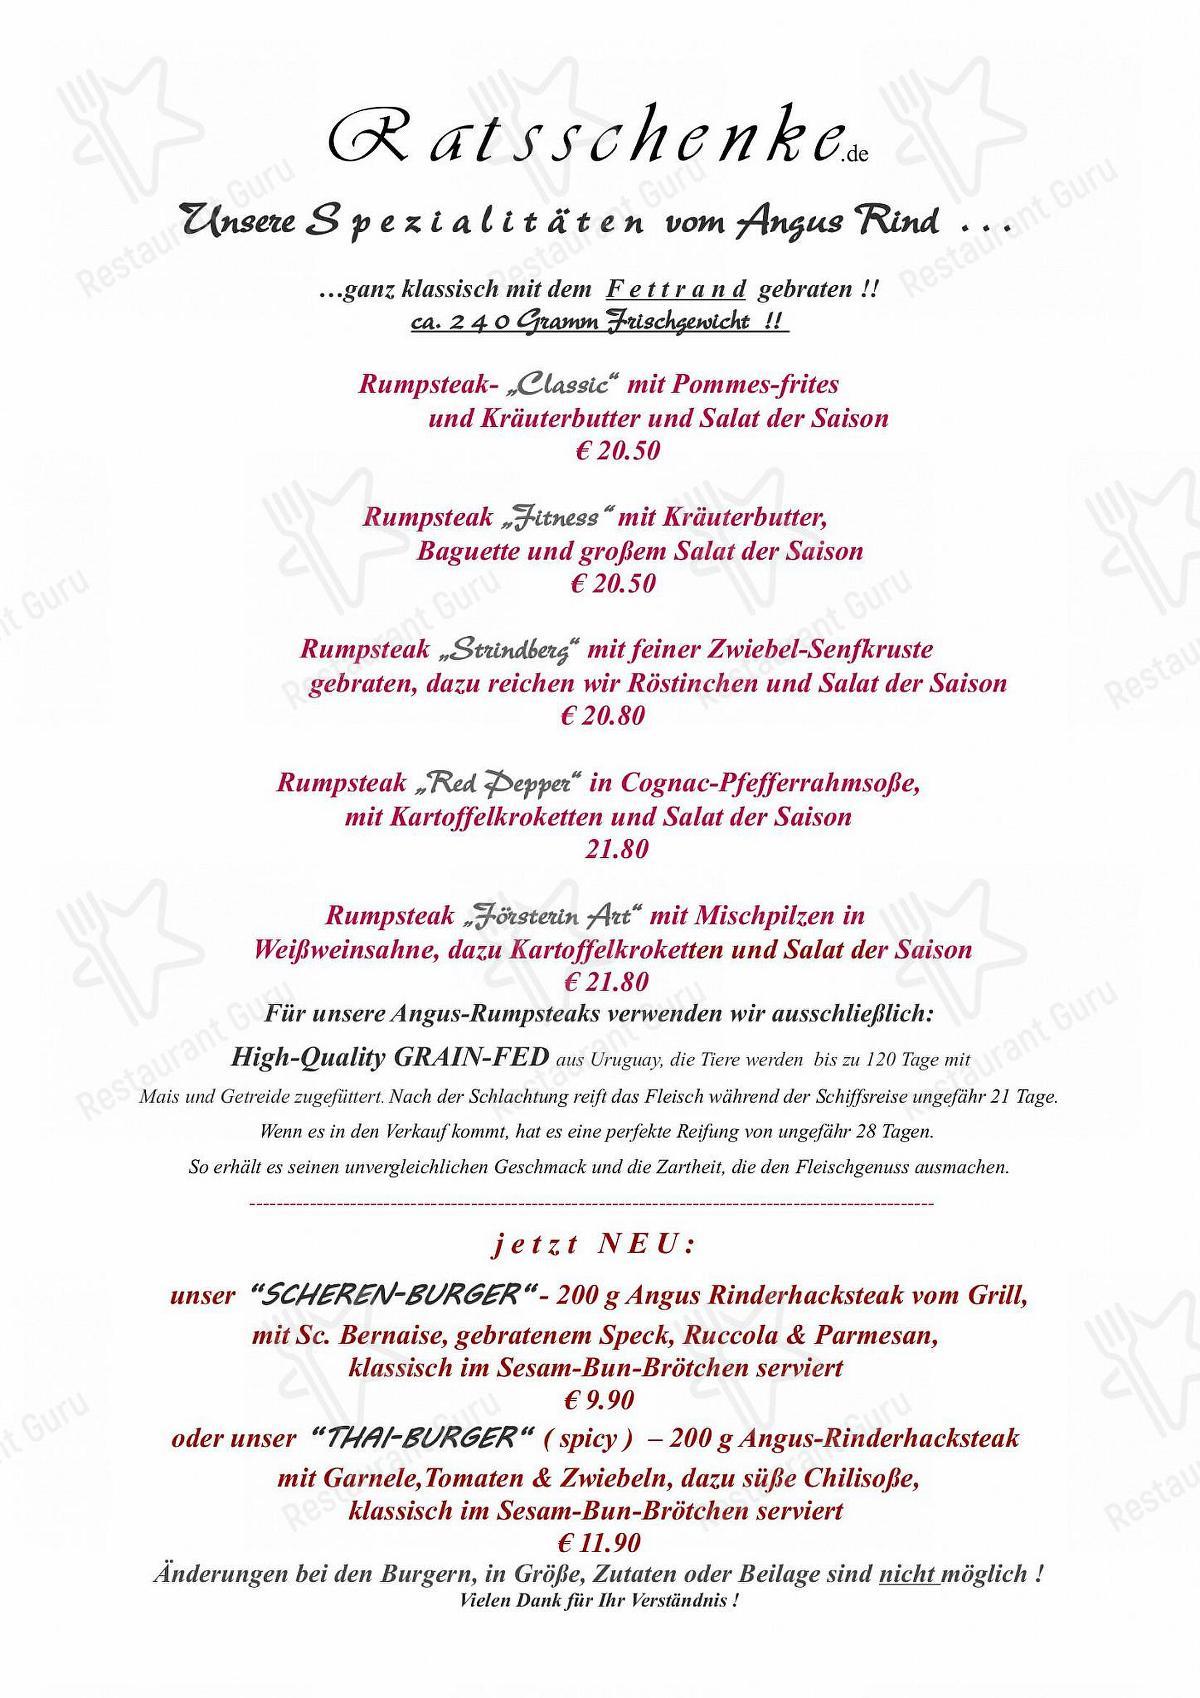 Carta de Ratsschenke restaurante